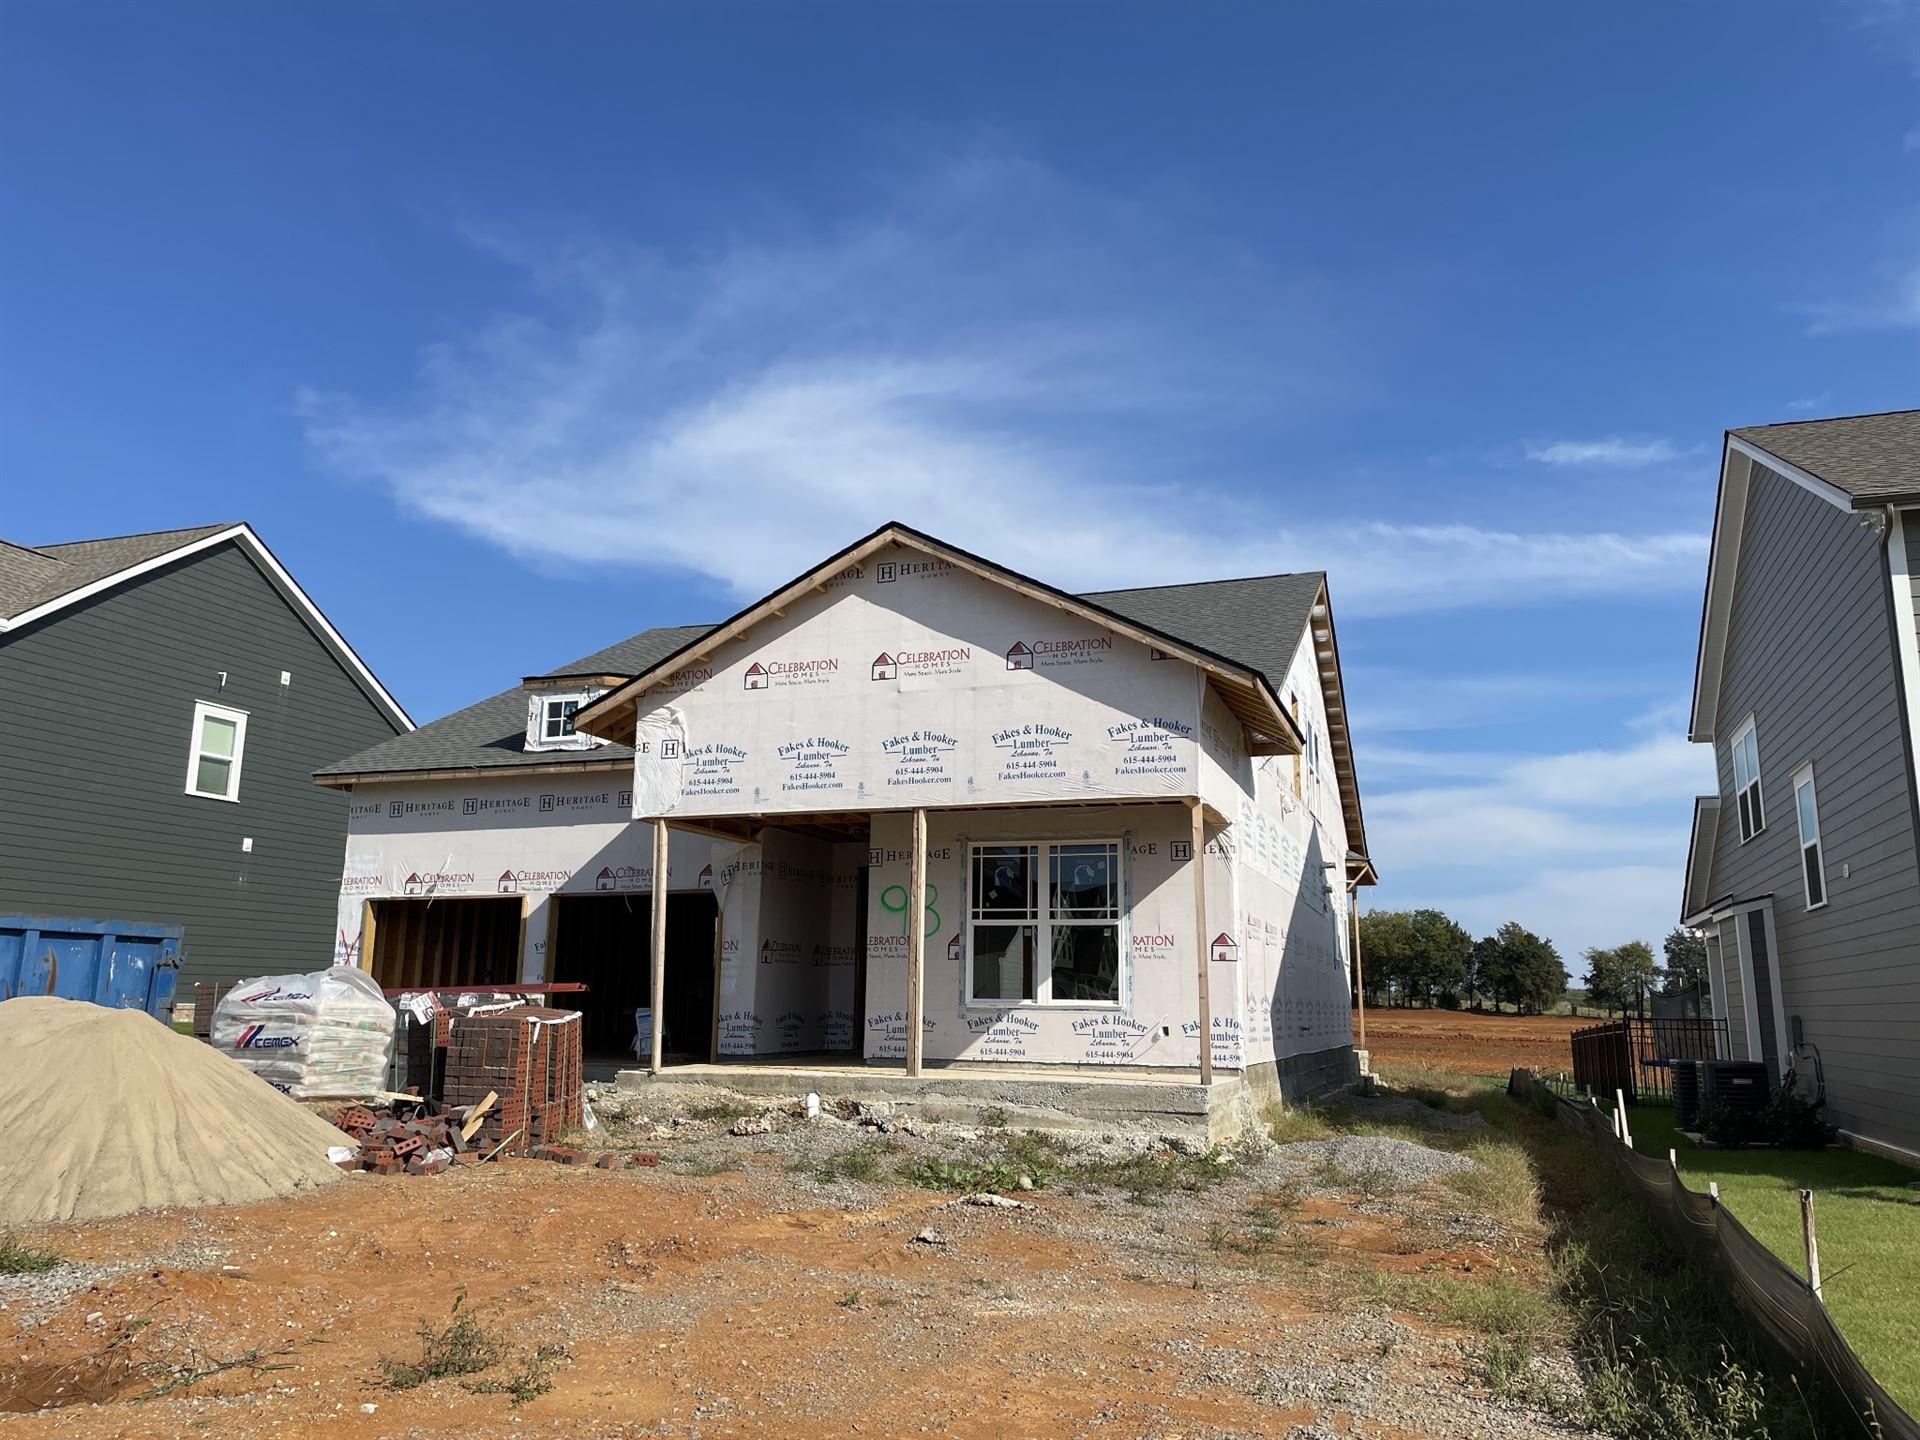 5231 Bridgemore Blvd., Murfreesboro, TN 37129 - MLS#: 2302704